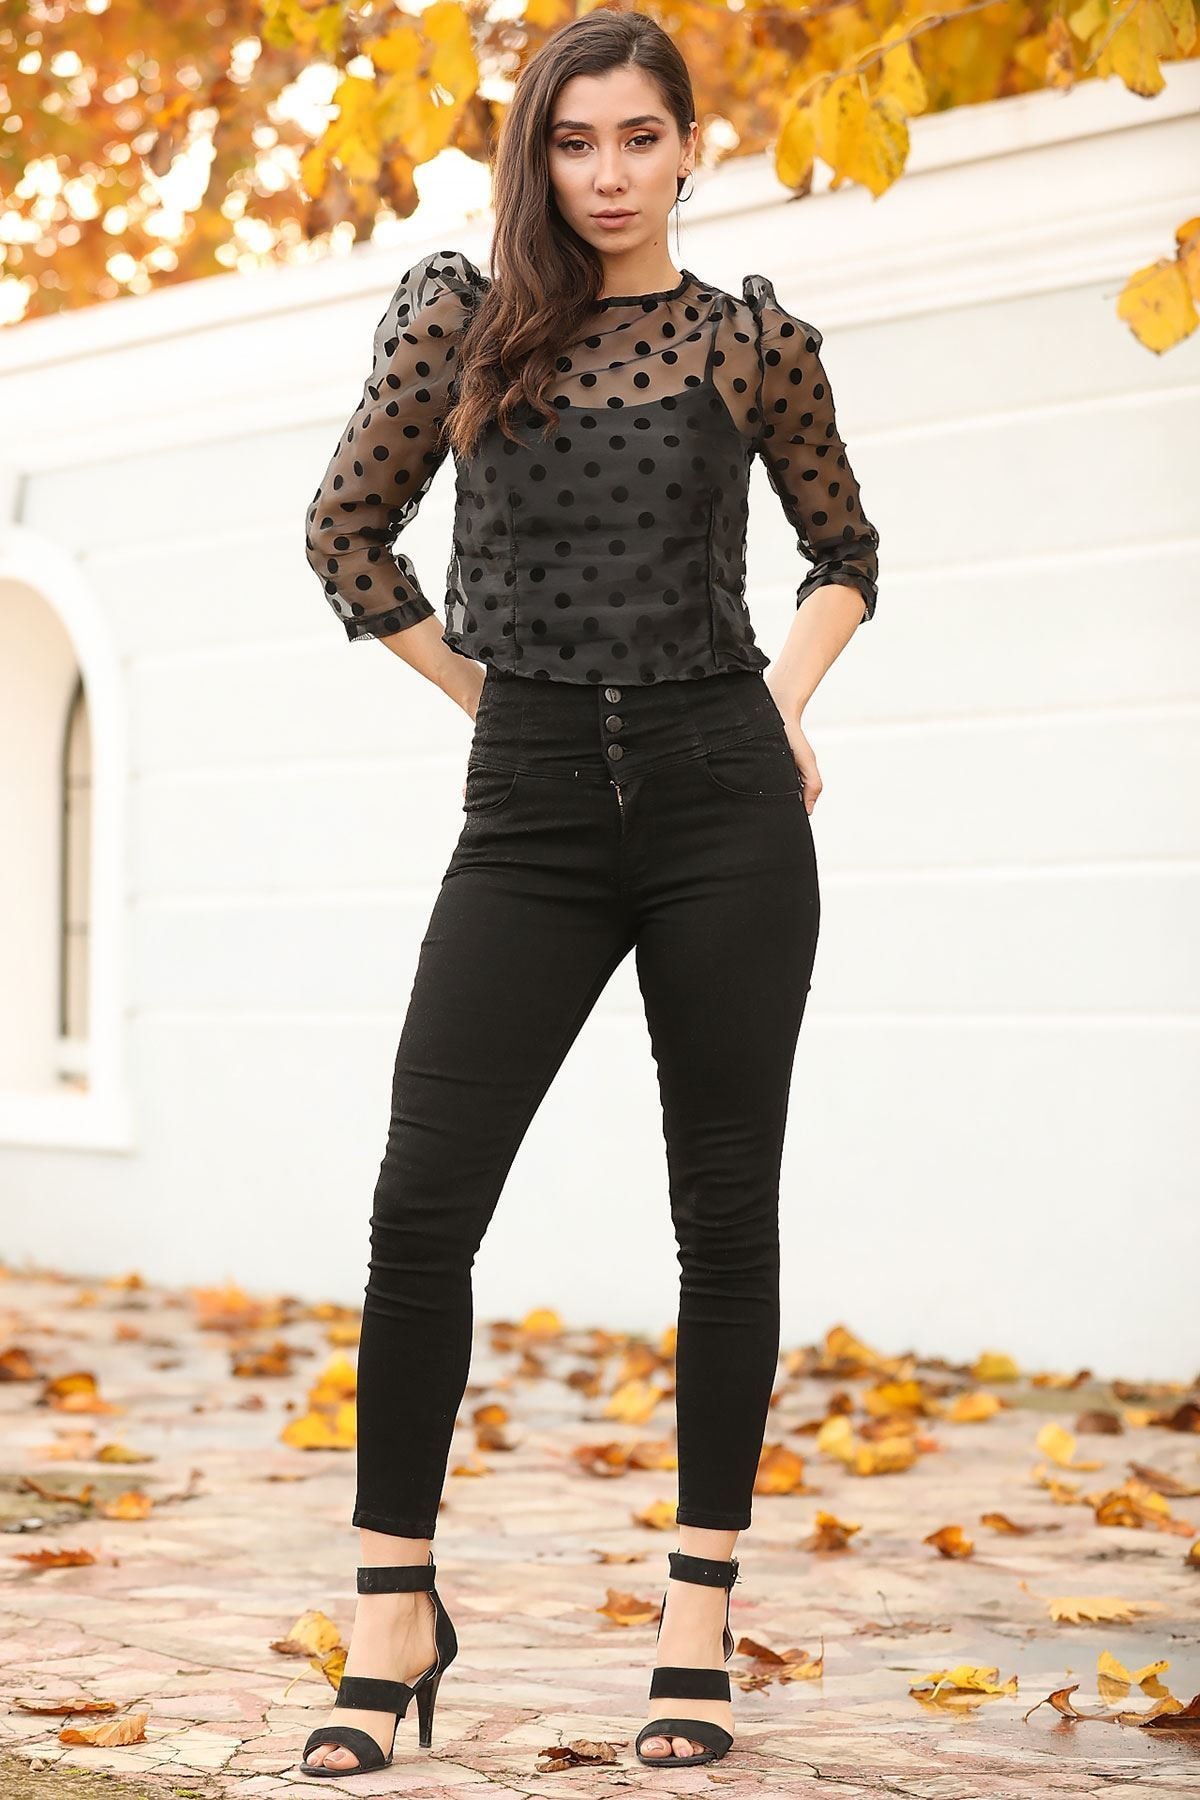 Nesrinden Yüksek Bel Siyah Kadın Kot Pantolon PNT0222D8056